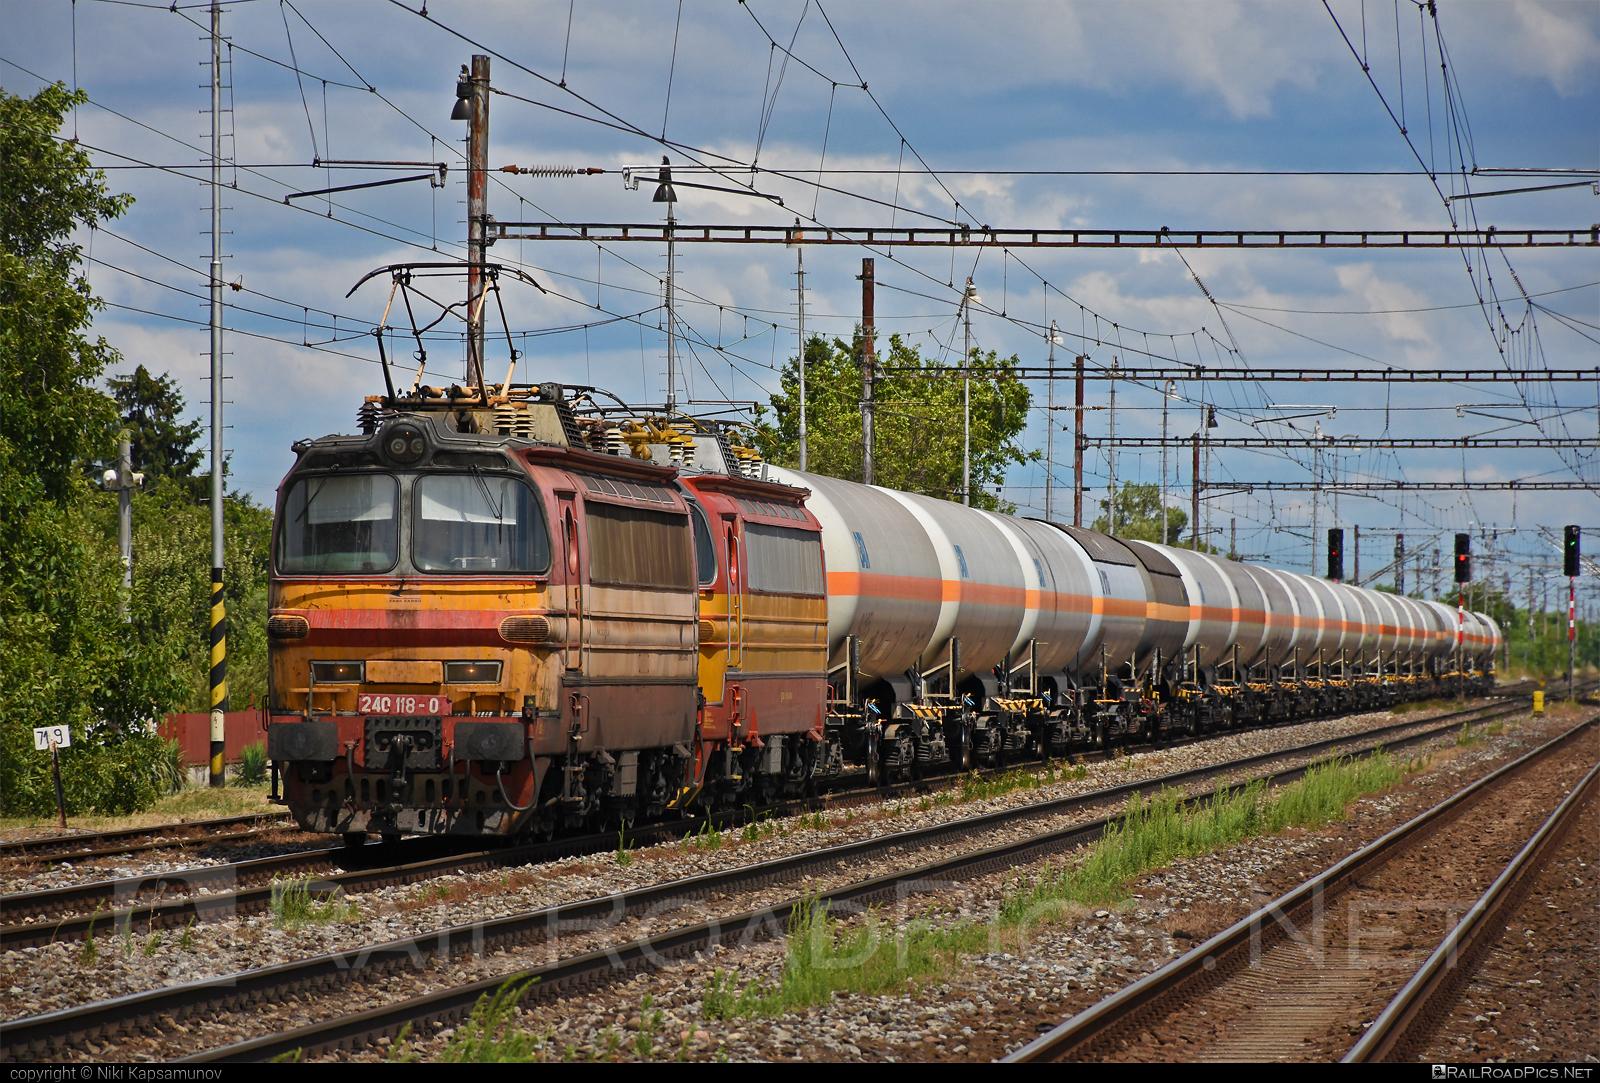 Škoda 47E - 240 118-0 operated by Železničná Spoločnost' Cargo Slovakia a.s. #ZeleznicnaSpolocnostCargoSlovakia #kesselwagen #laminatka #locomotive240 #skoda #skoda47e #tankwagon #zsskcargo